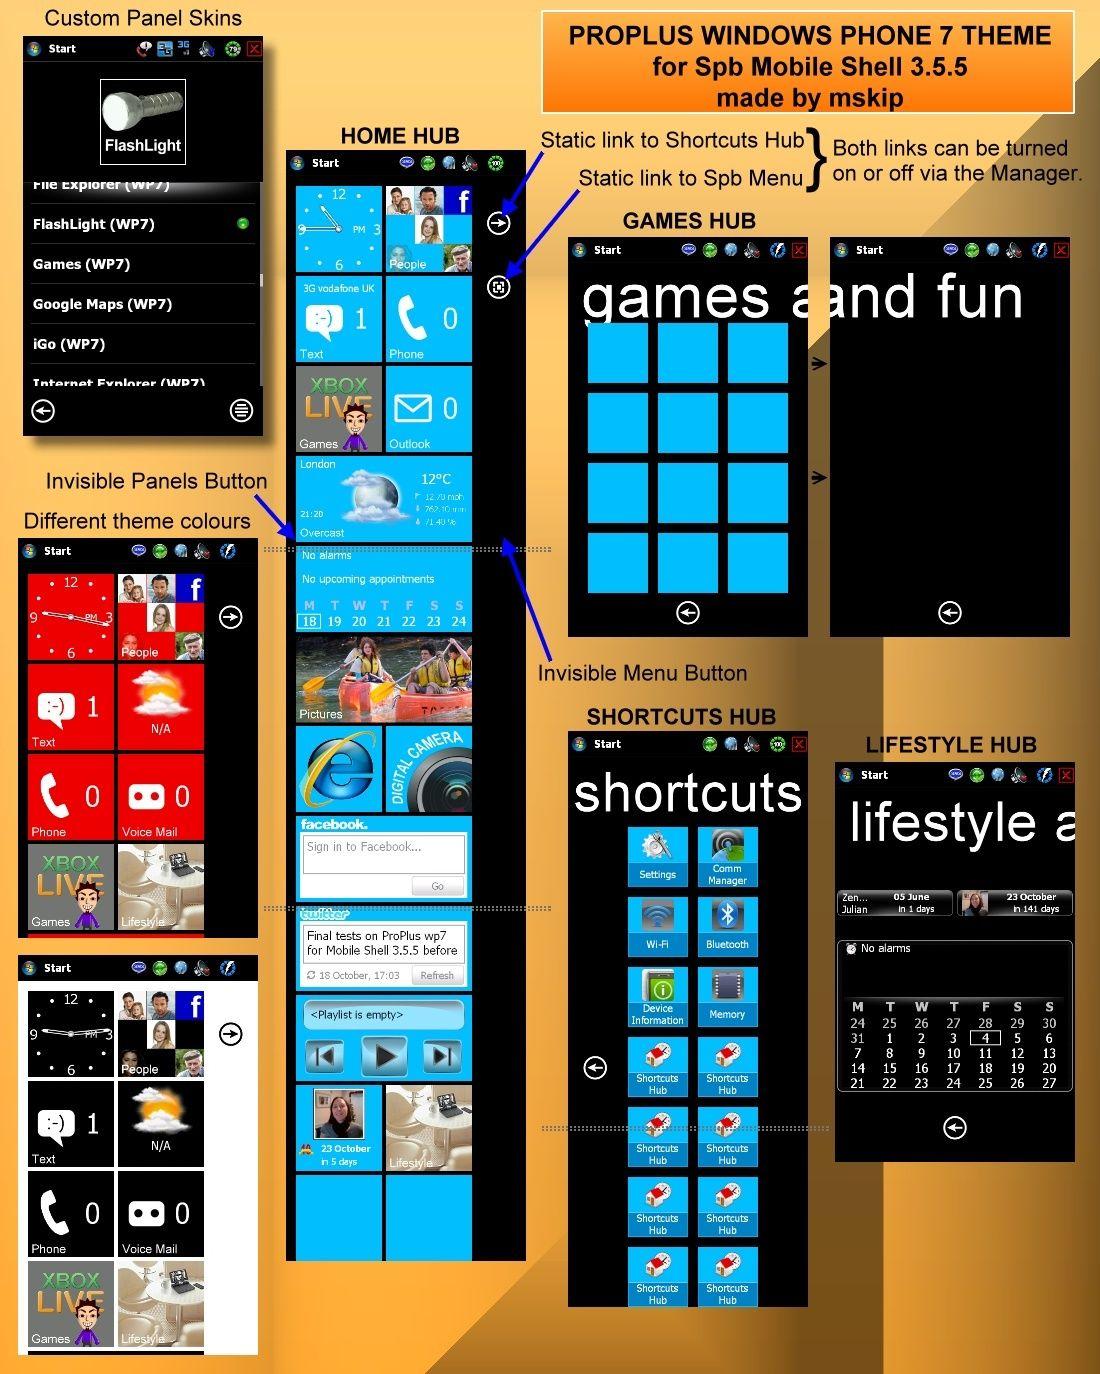 (Thème SPB Mobile Shell): Un air de Windows Phone7(Source xda) Proplu13